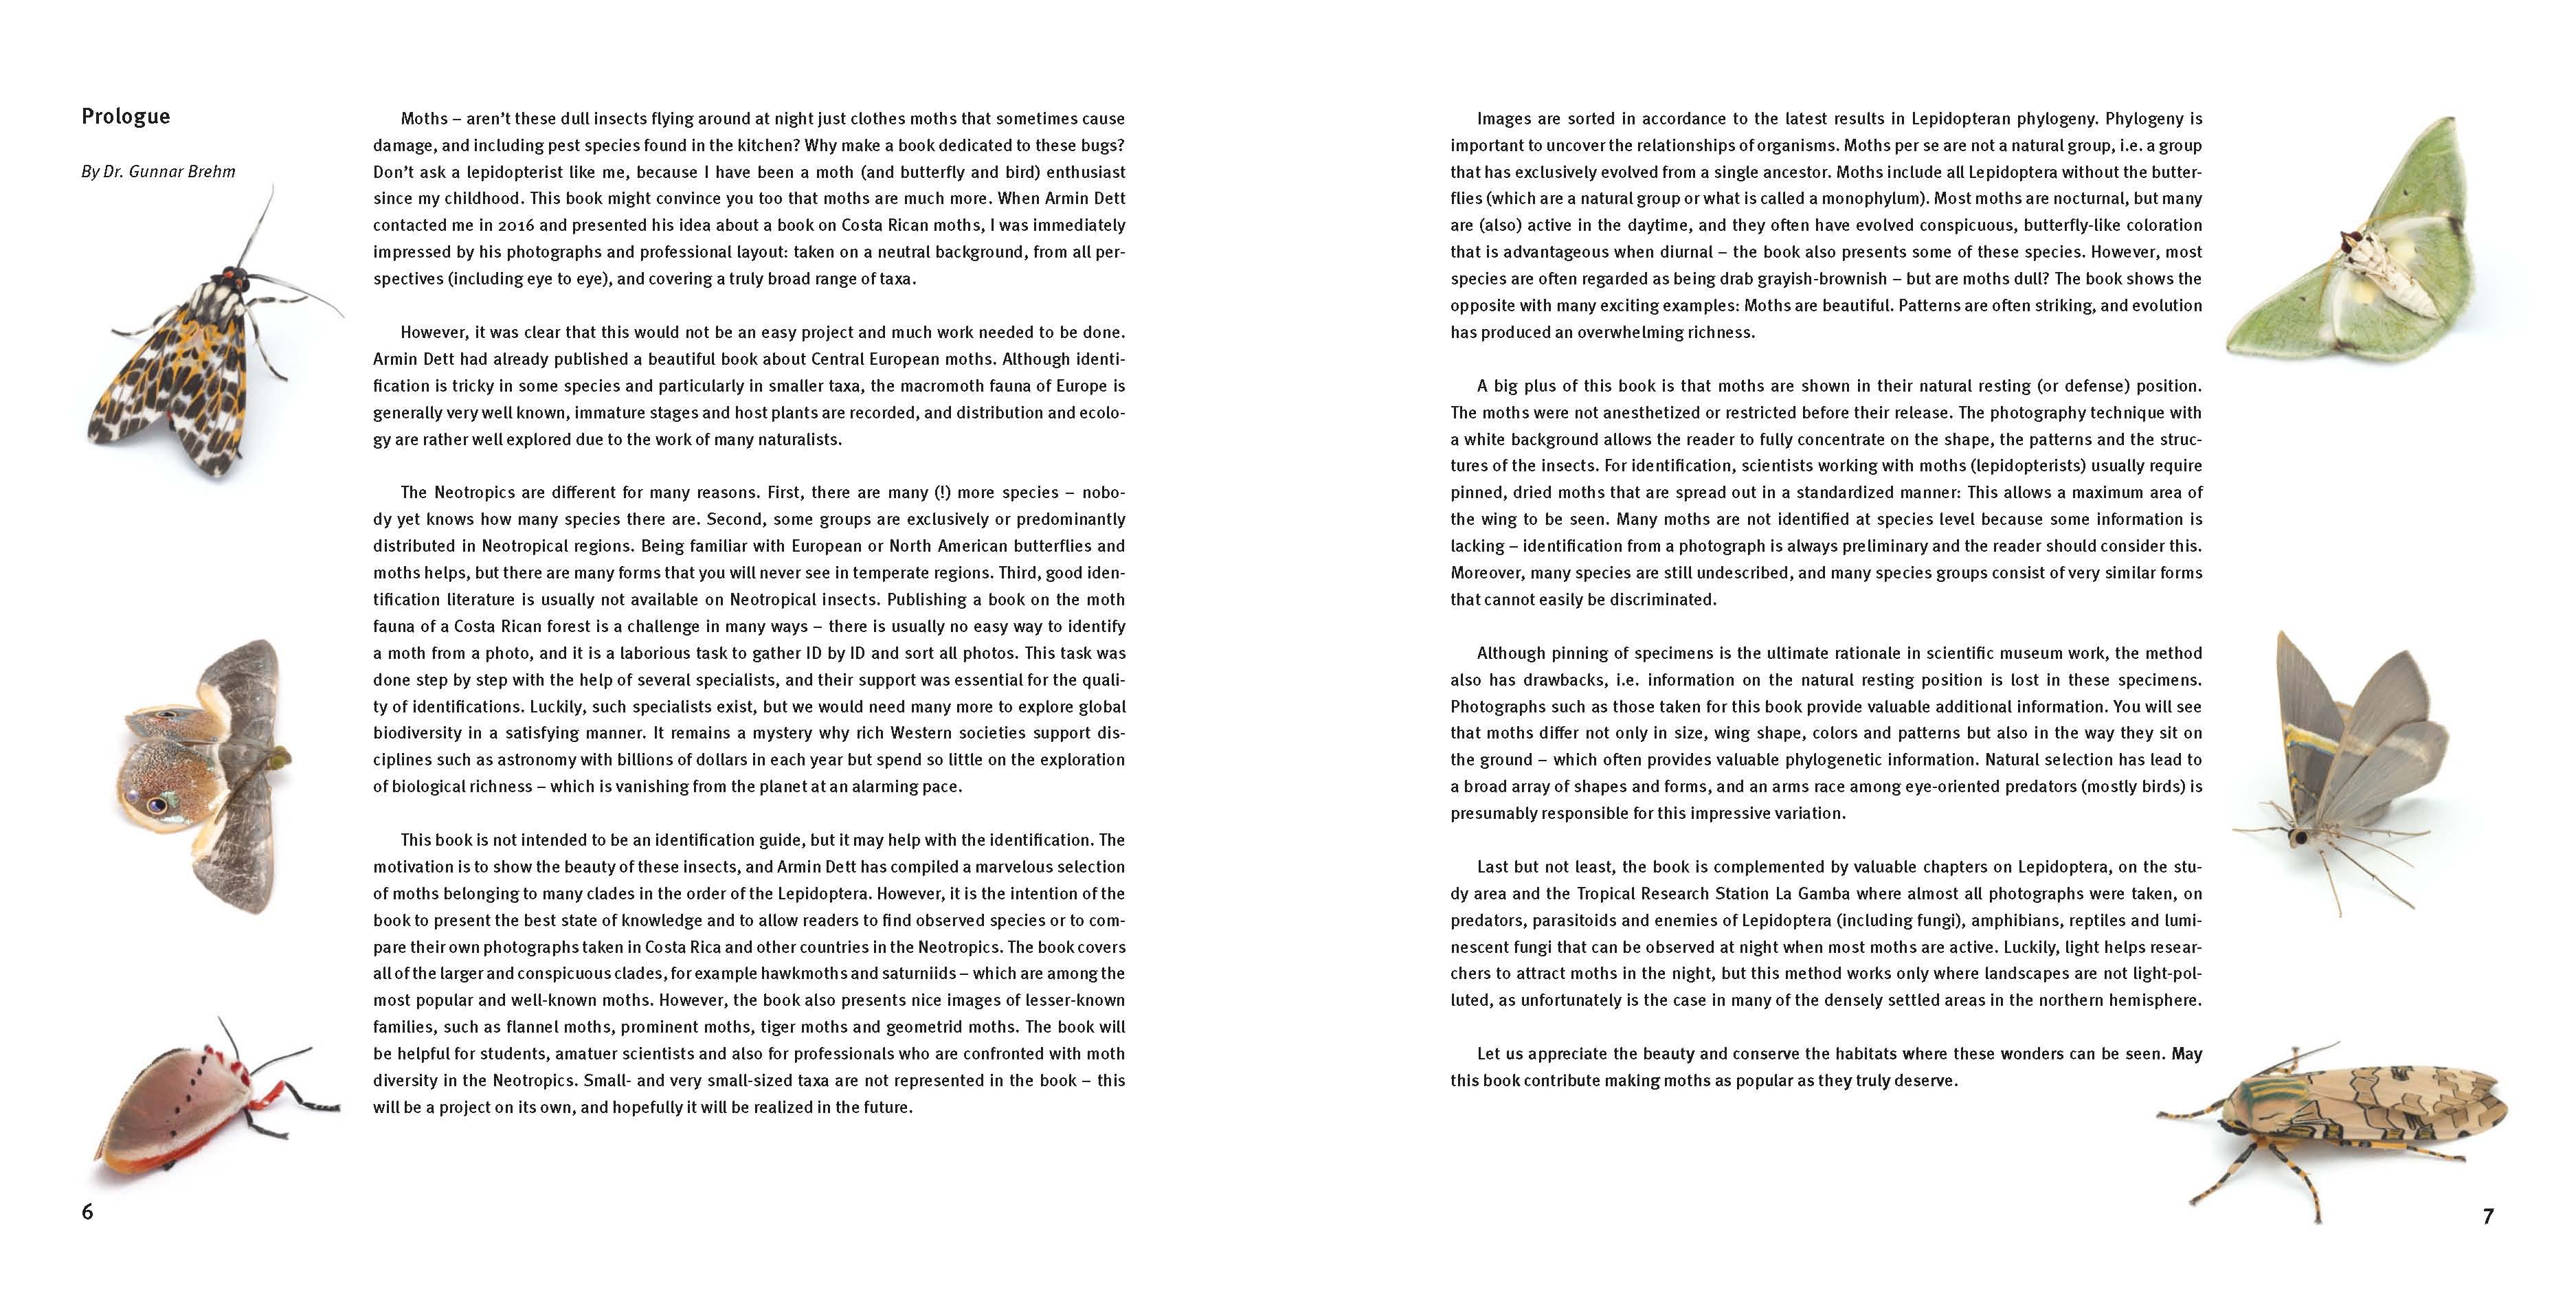 Seite 6-7